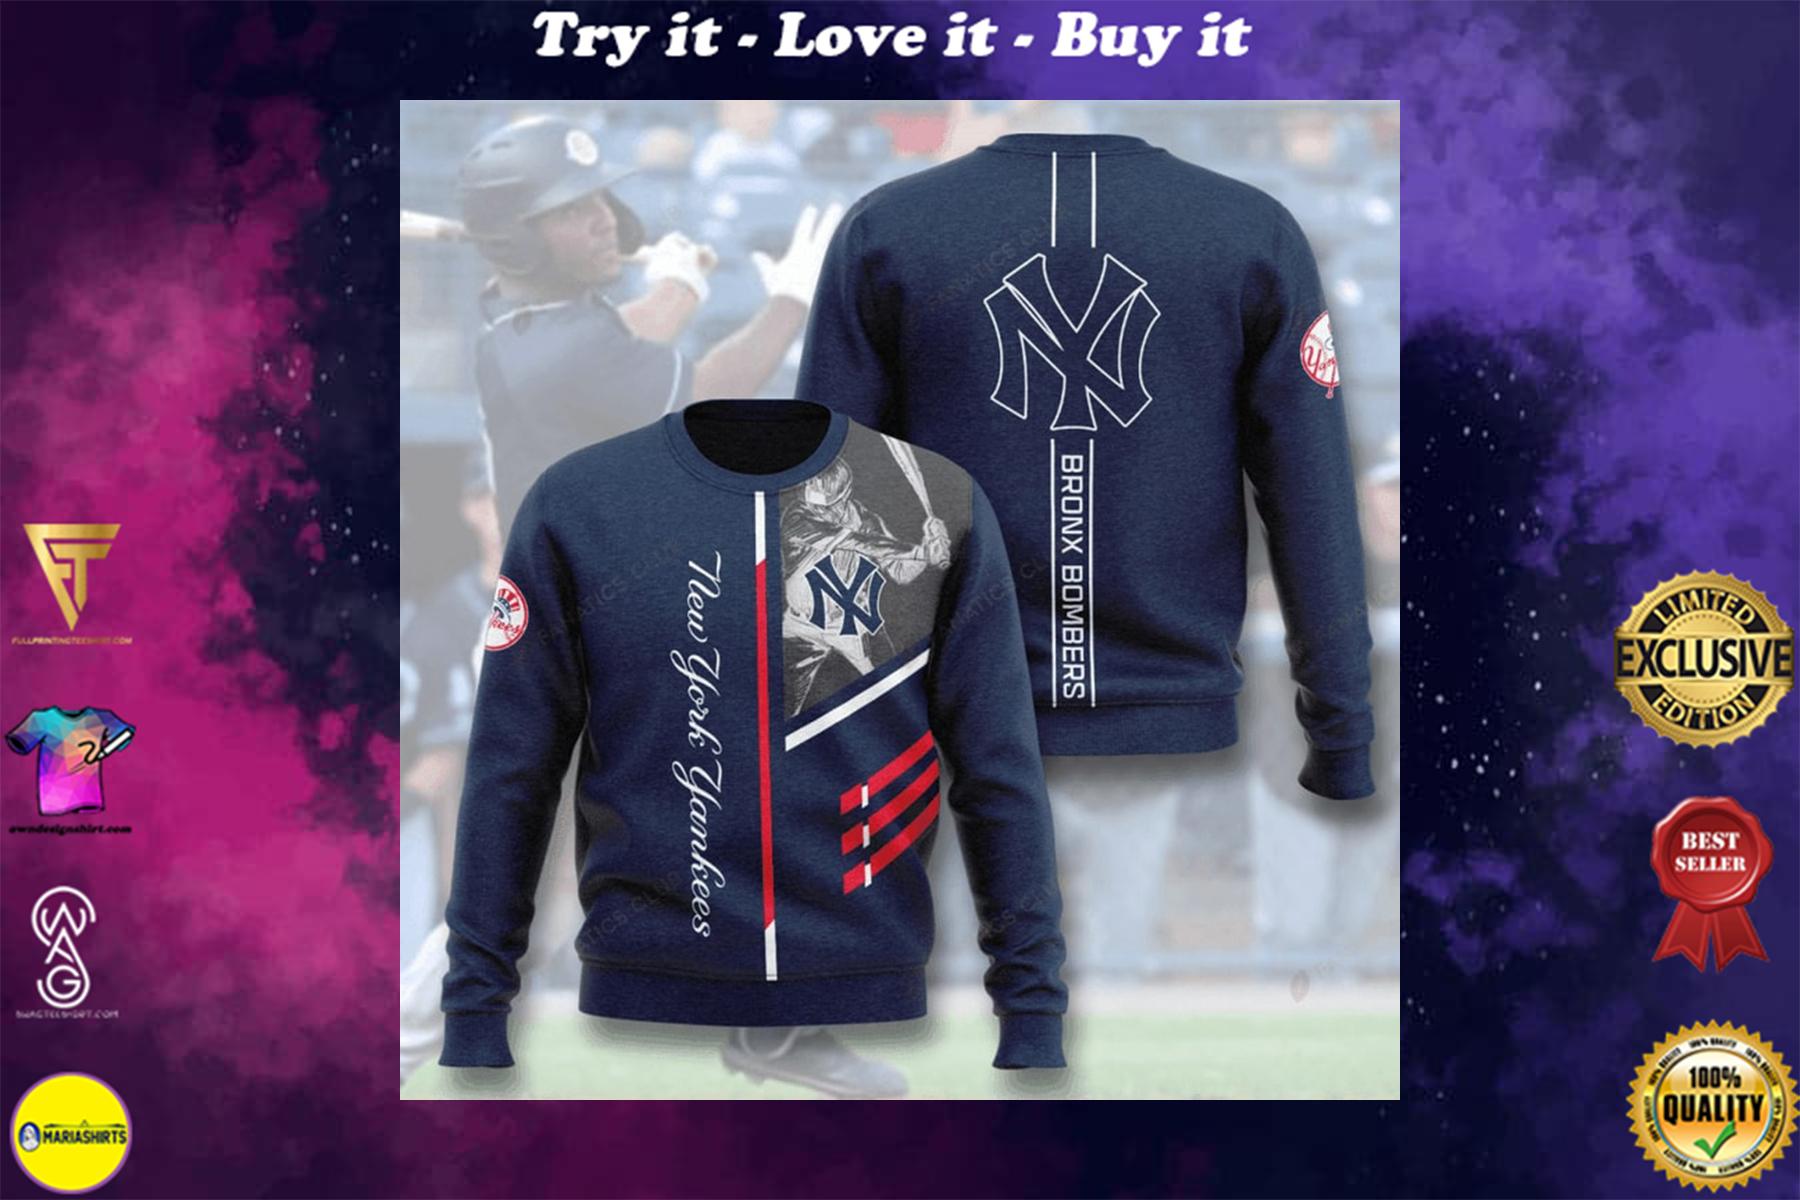 [highest selling] new york yankees bronx bombers full printing ugly sweater - maria